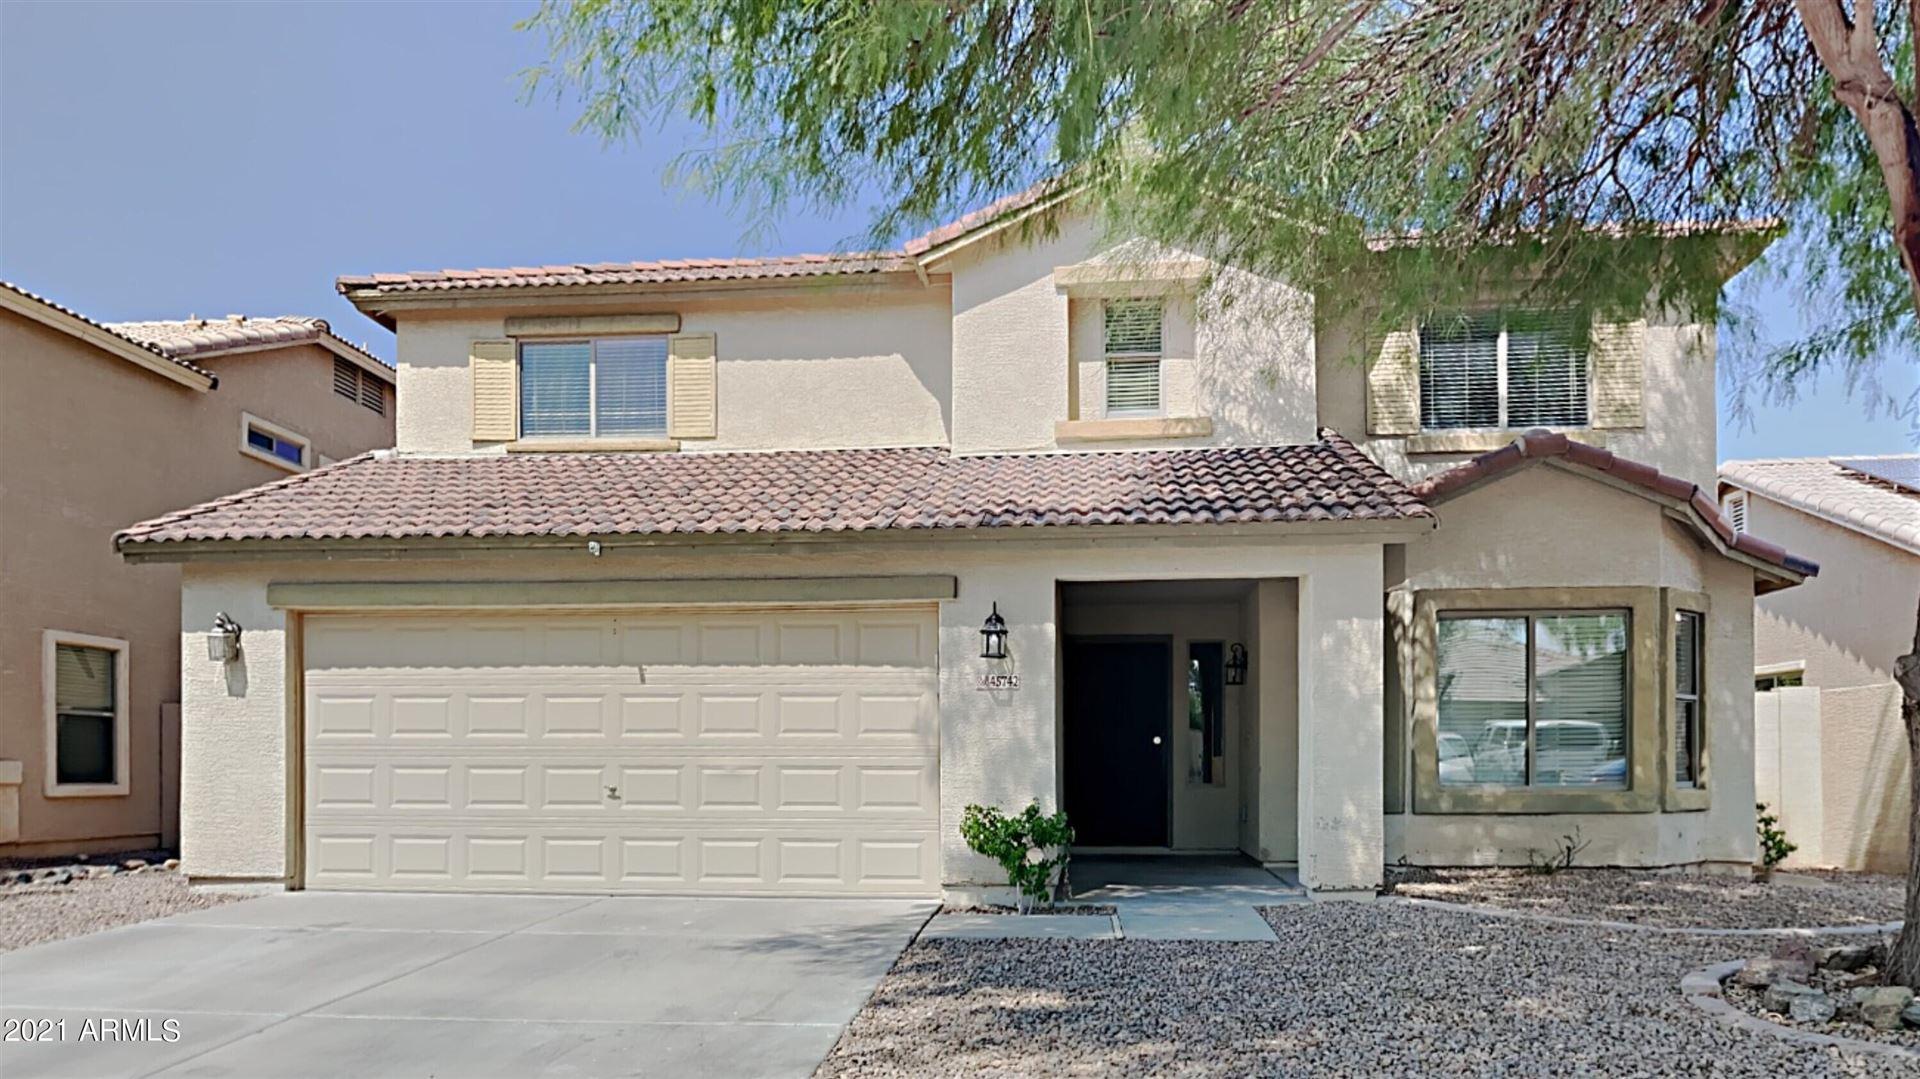 45742 W LONG Way, Maricopa, AZ 85139 - #: 6295471